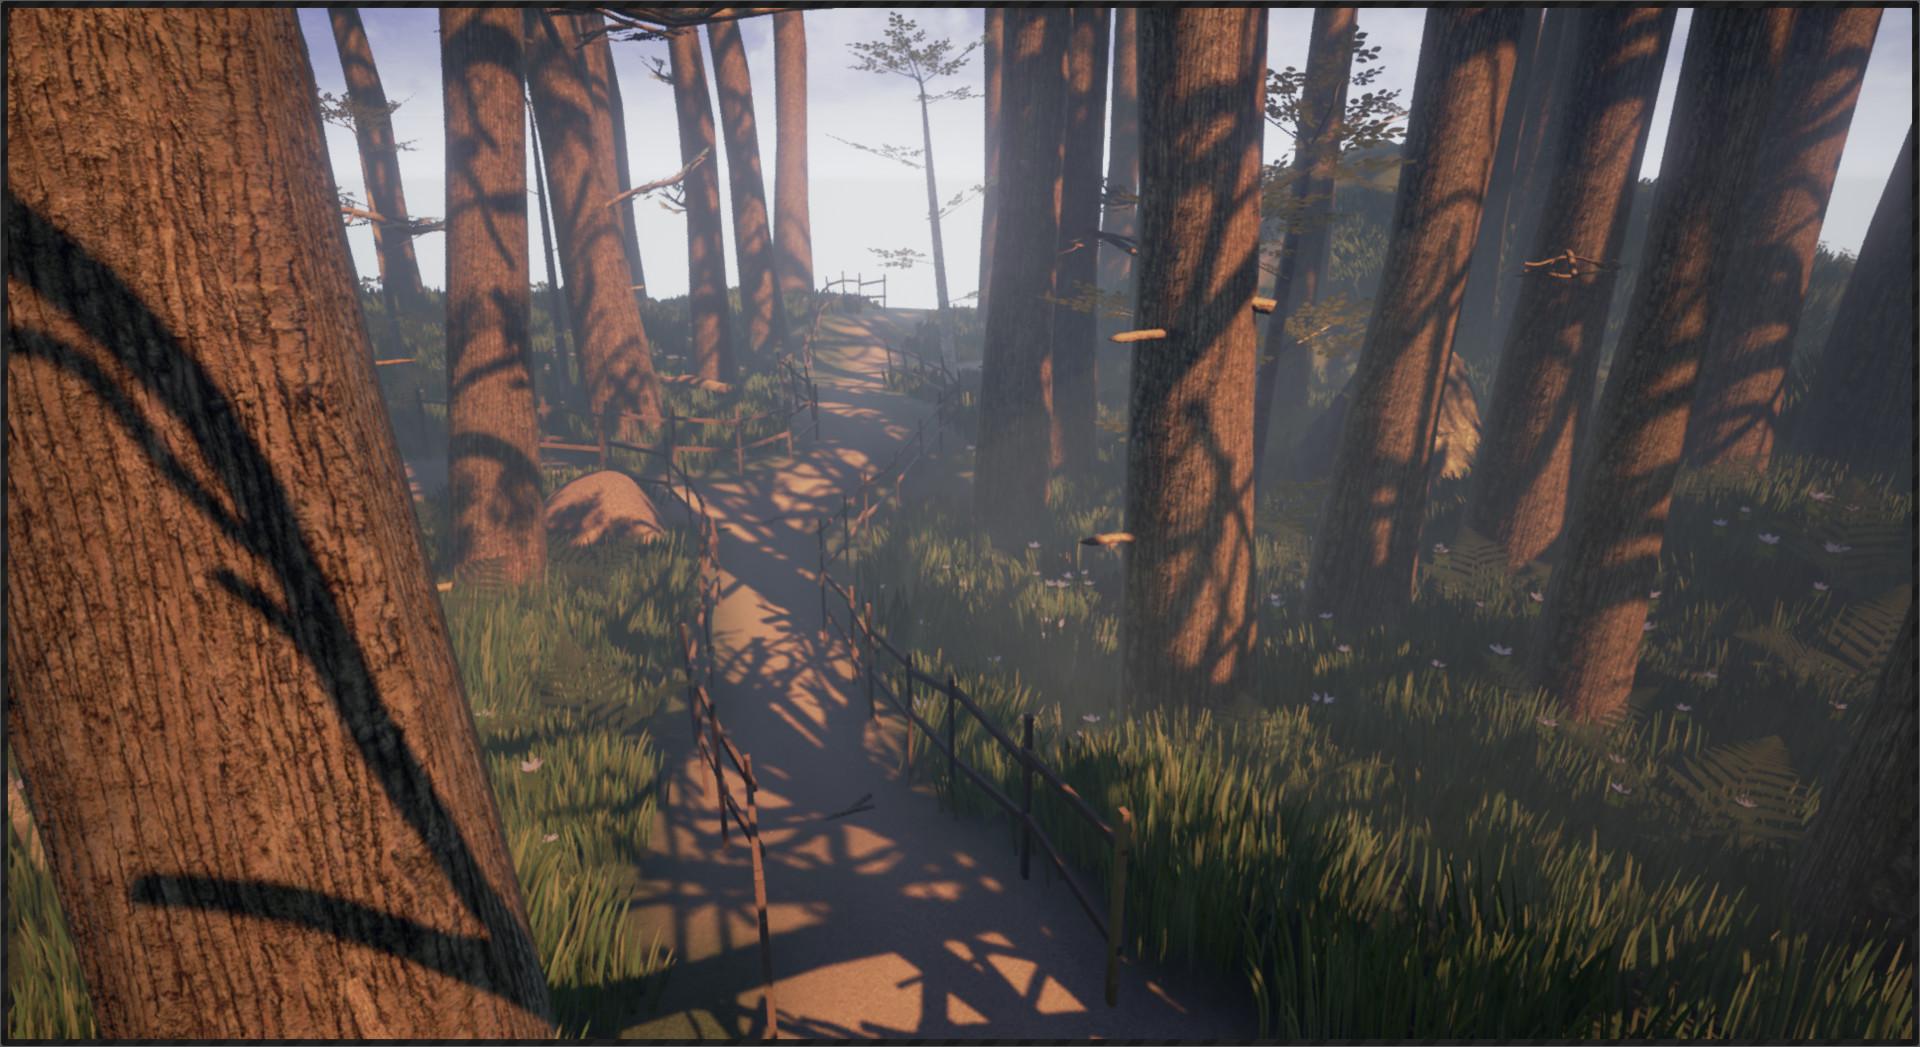 Christoffer sjostrom screenshot00000